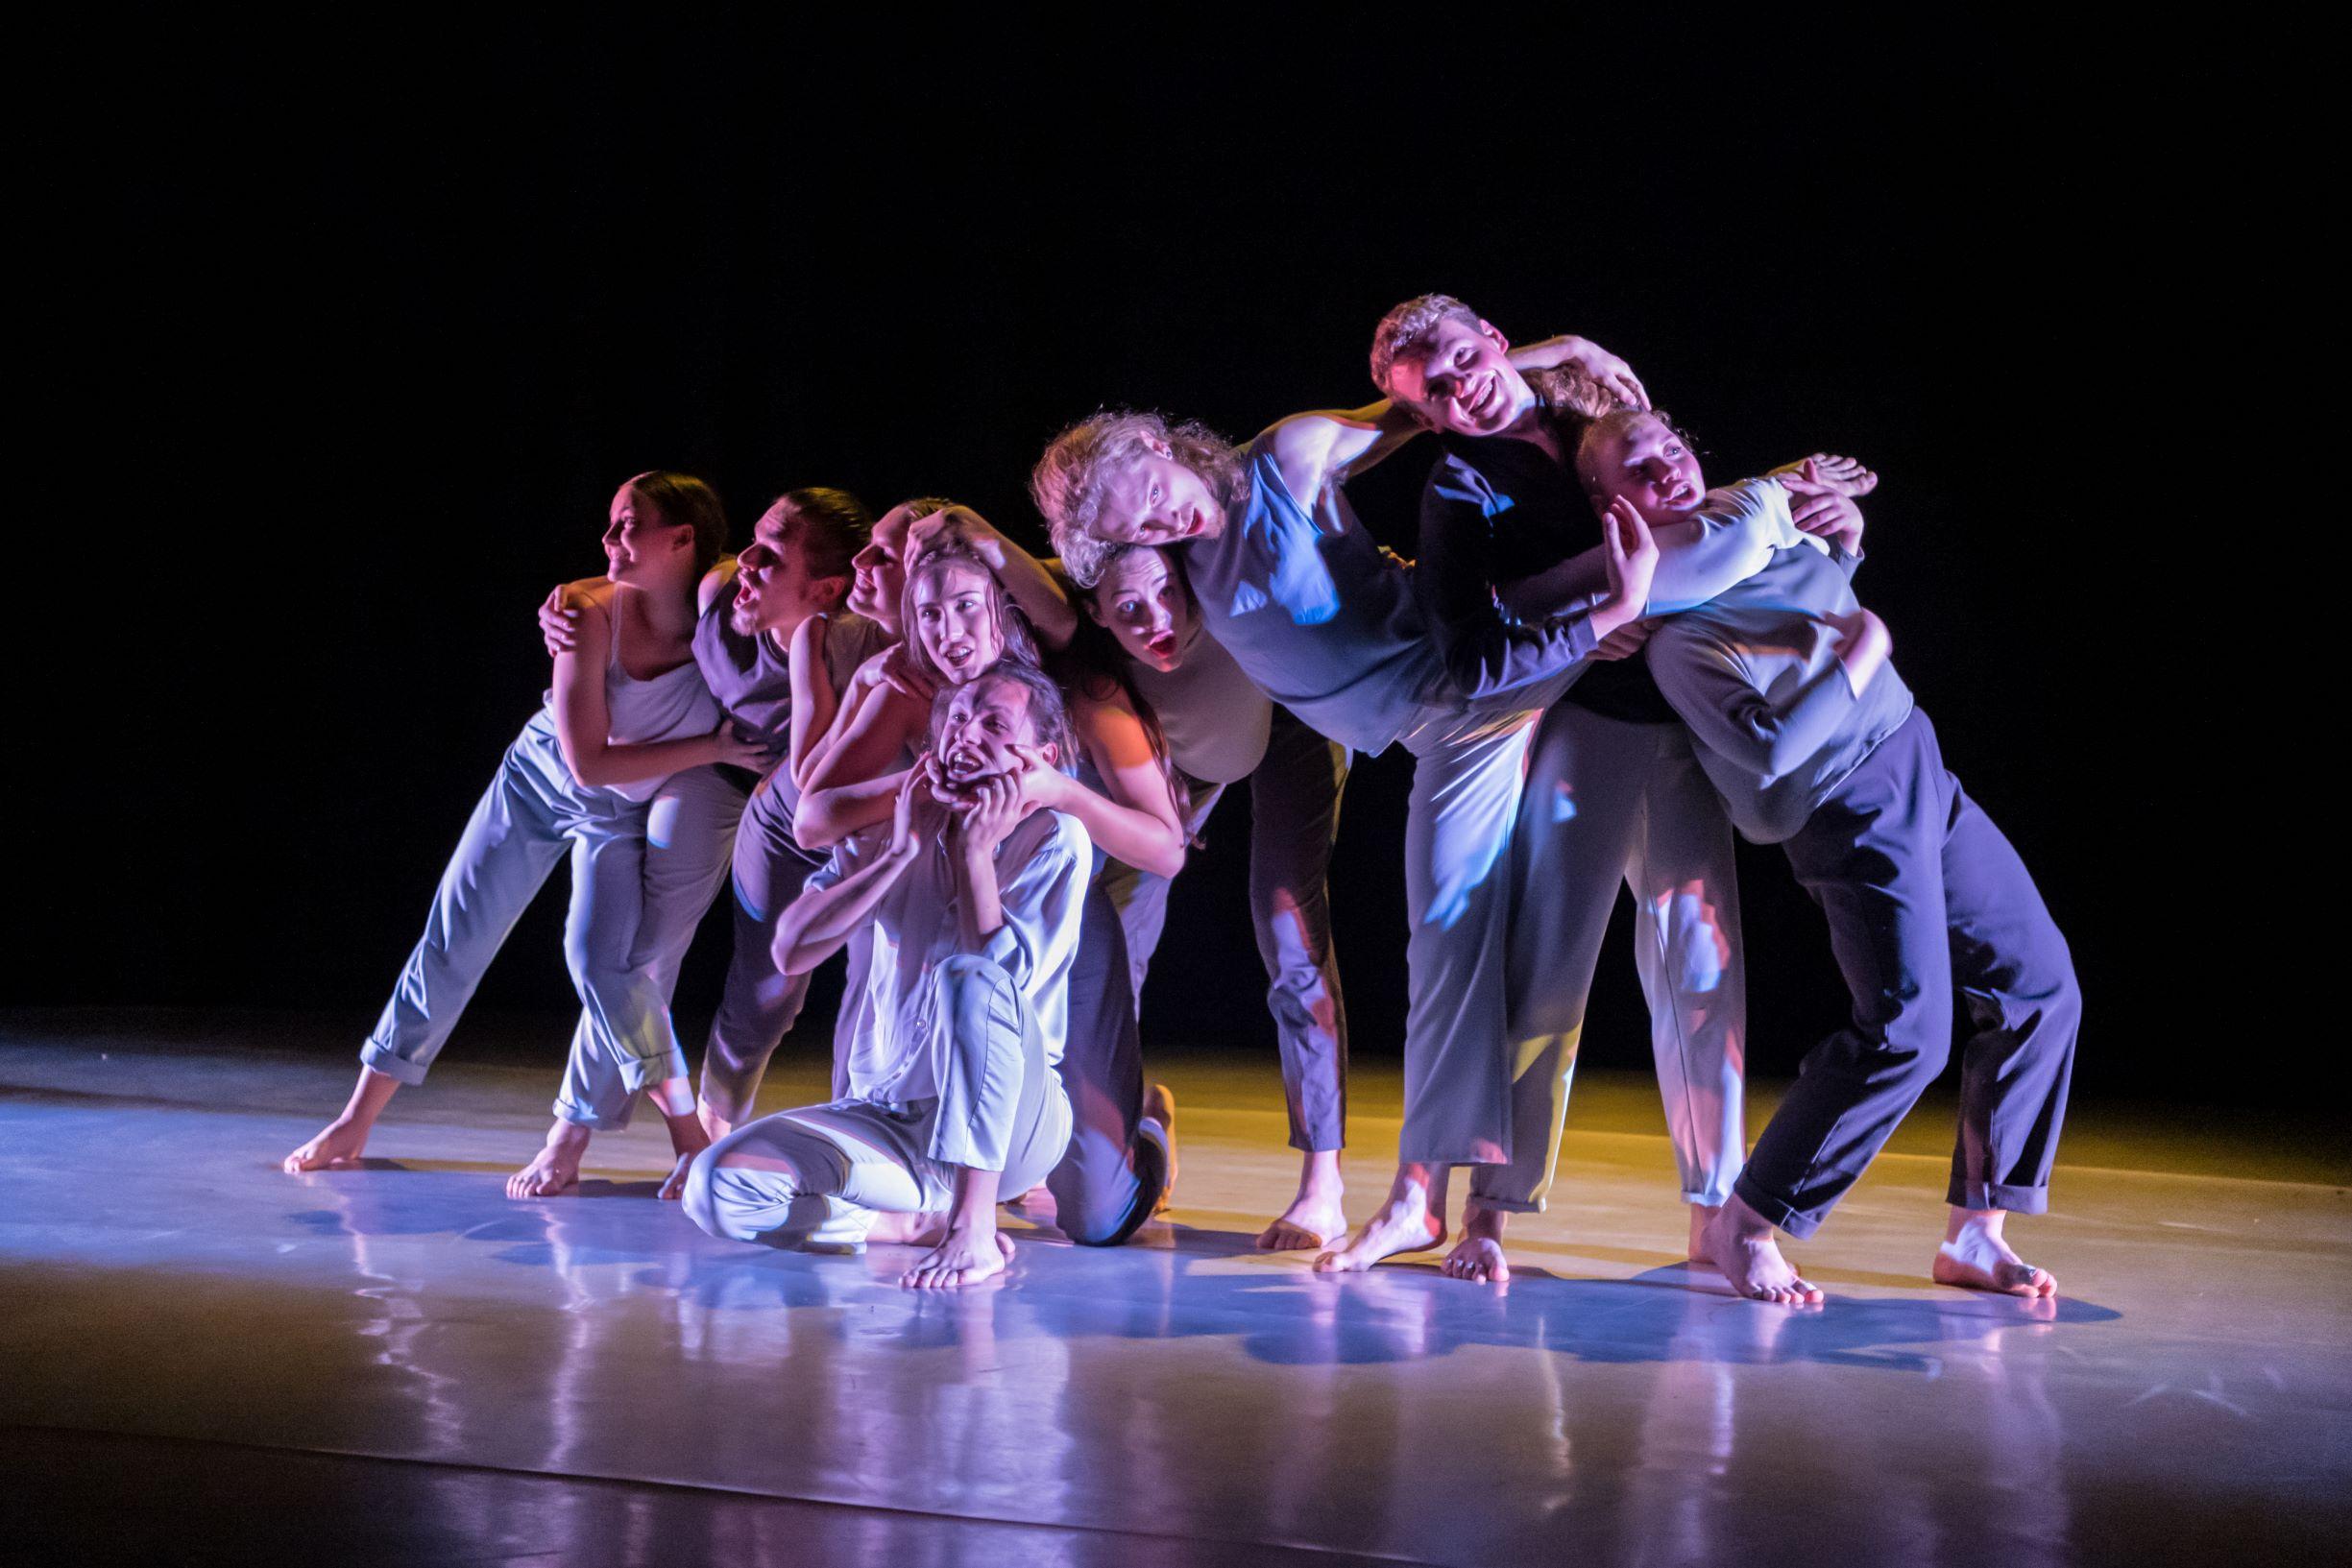 NZSD Choreographic Season | ORBICULUS 2019